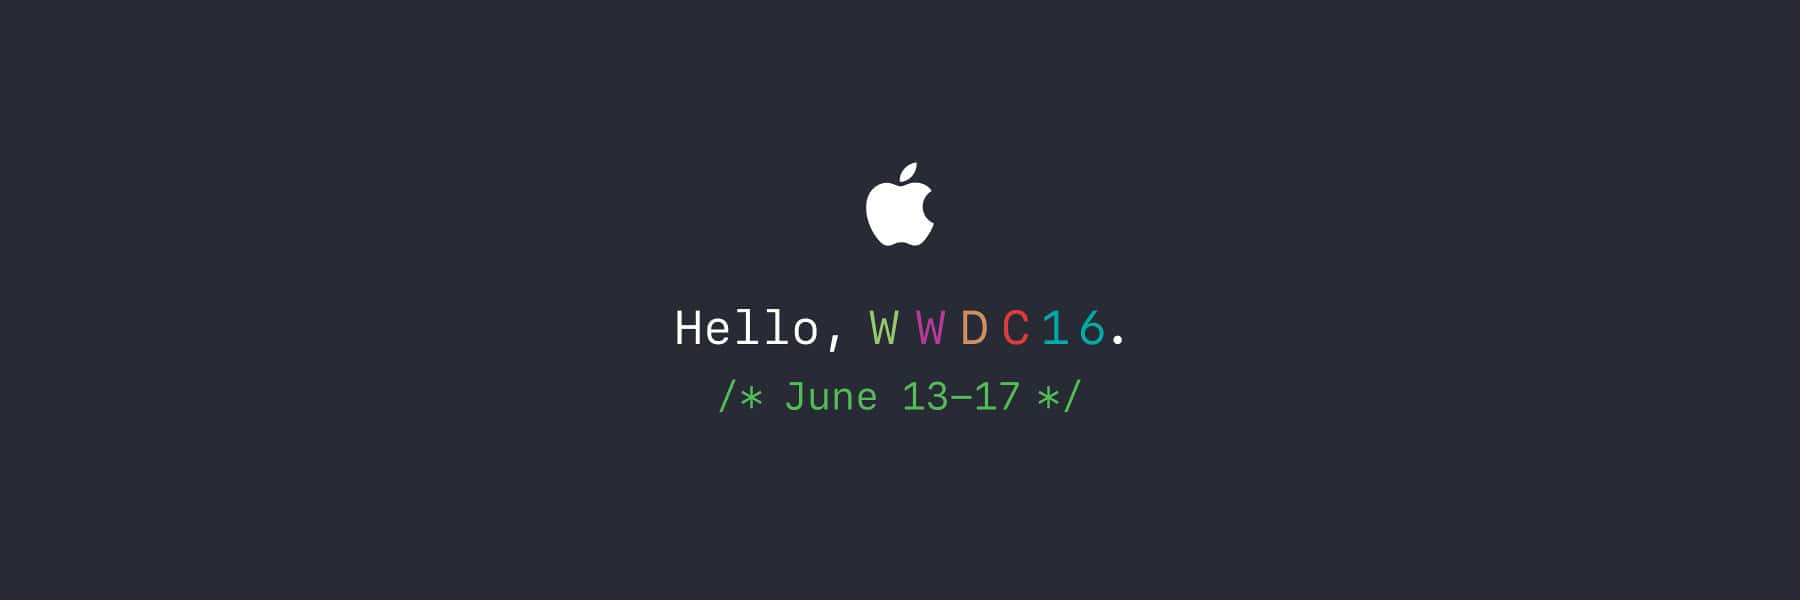 WWDC16: Apple verrät neue HomeKit Funktionen